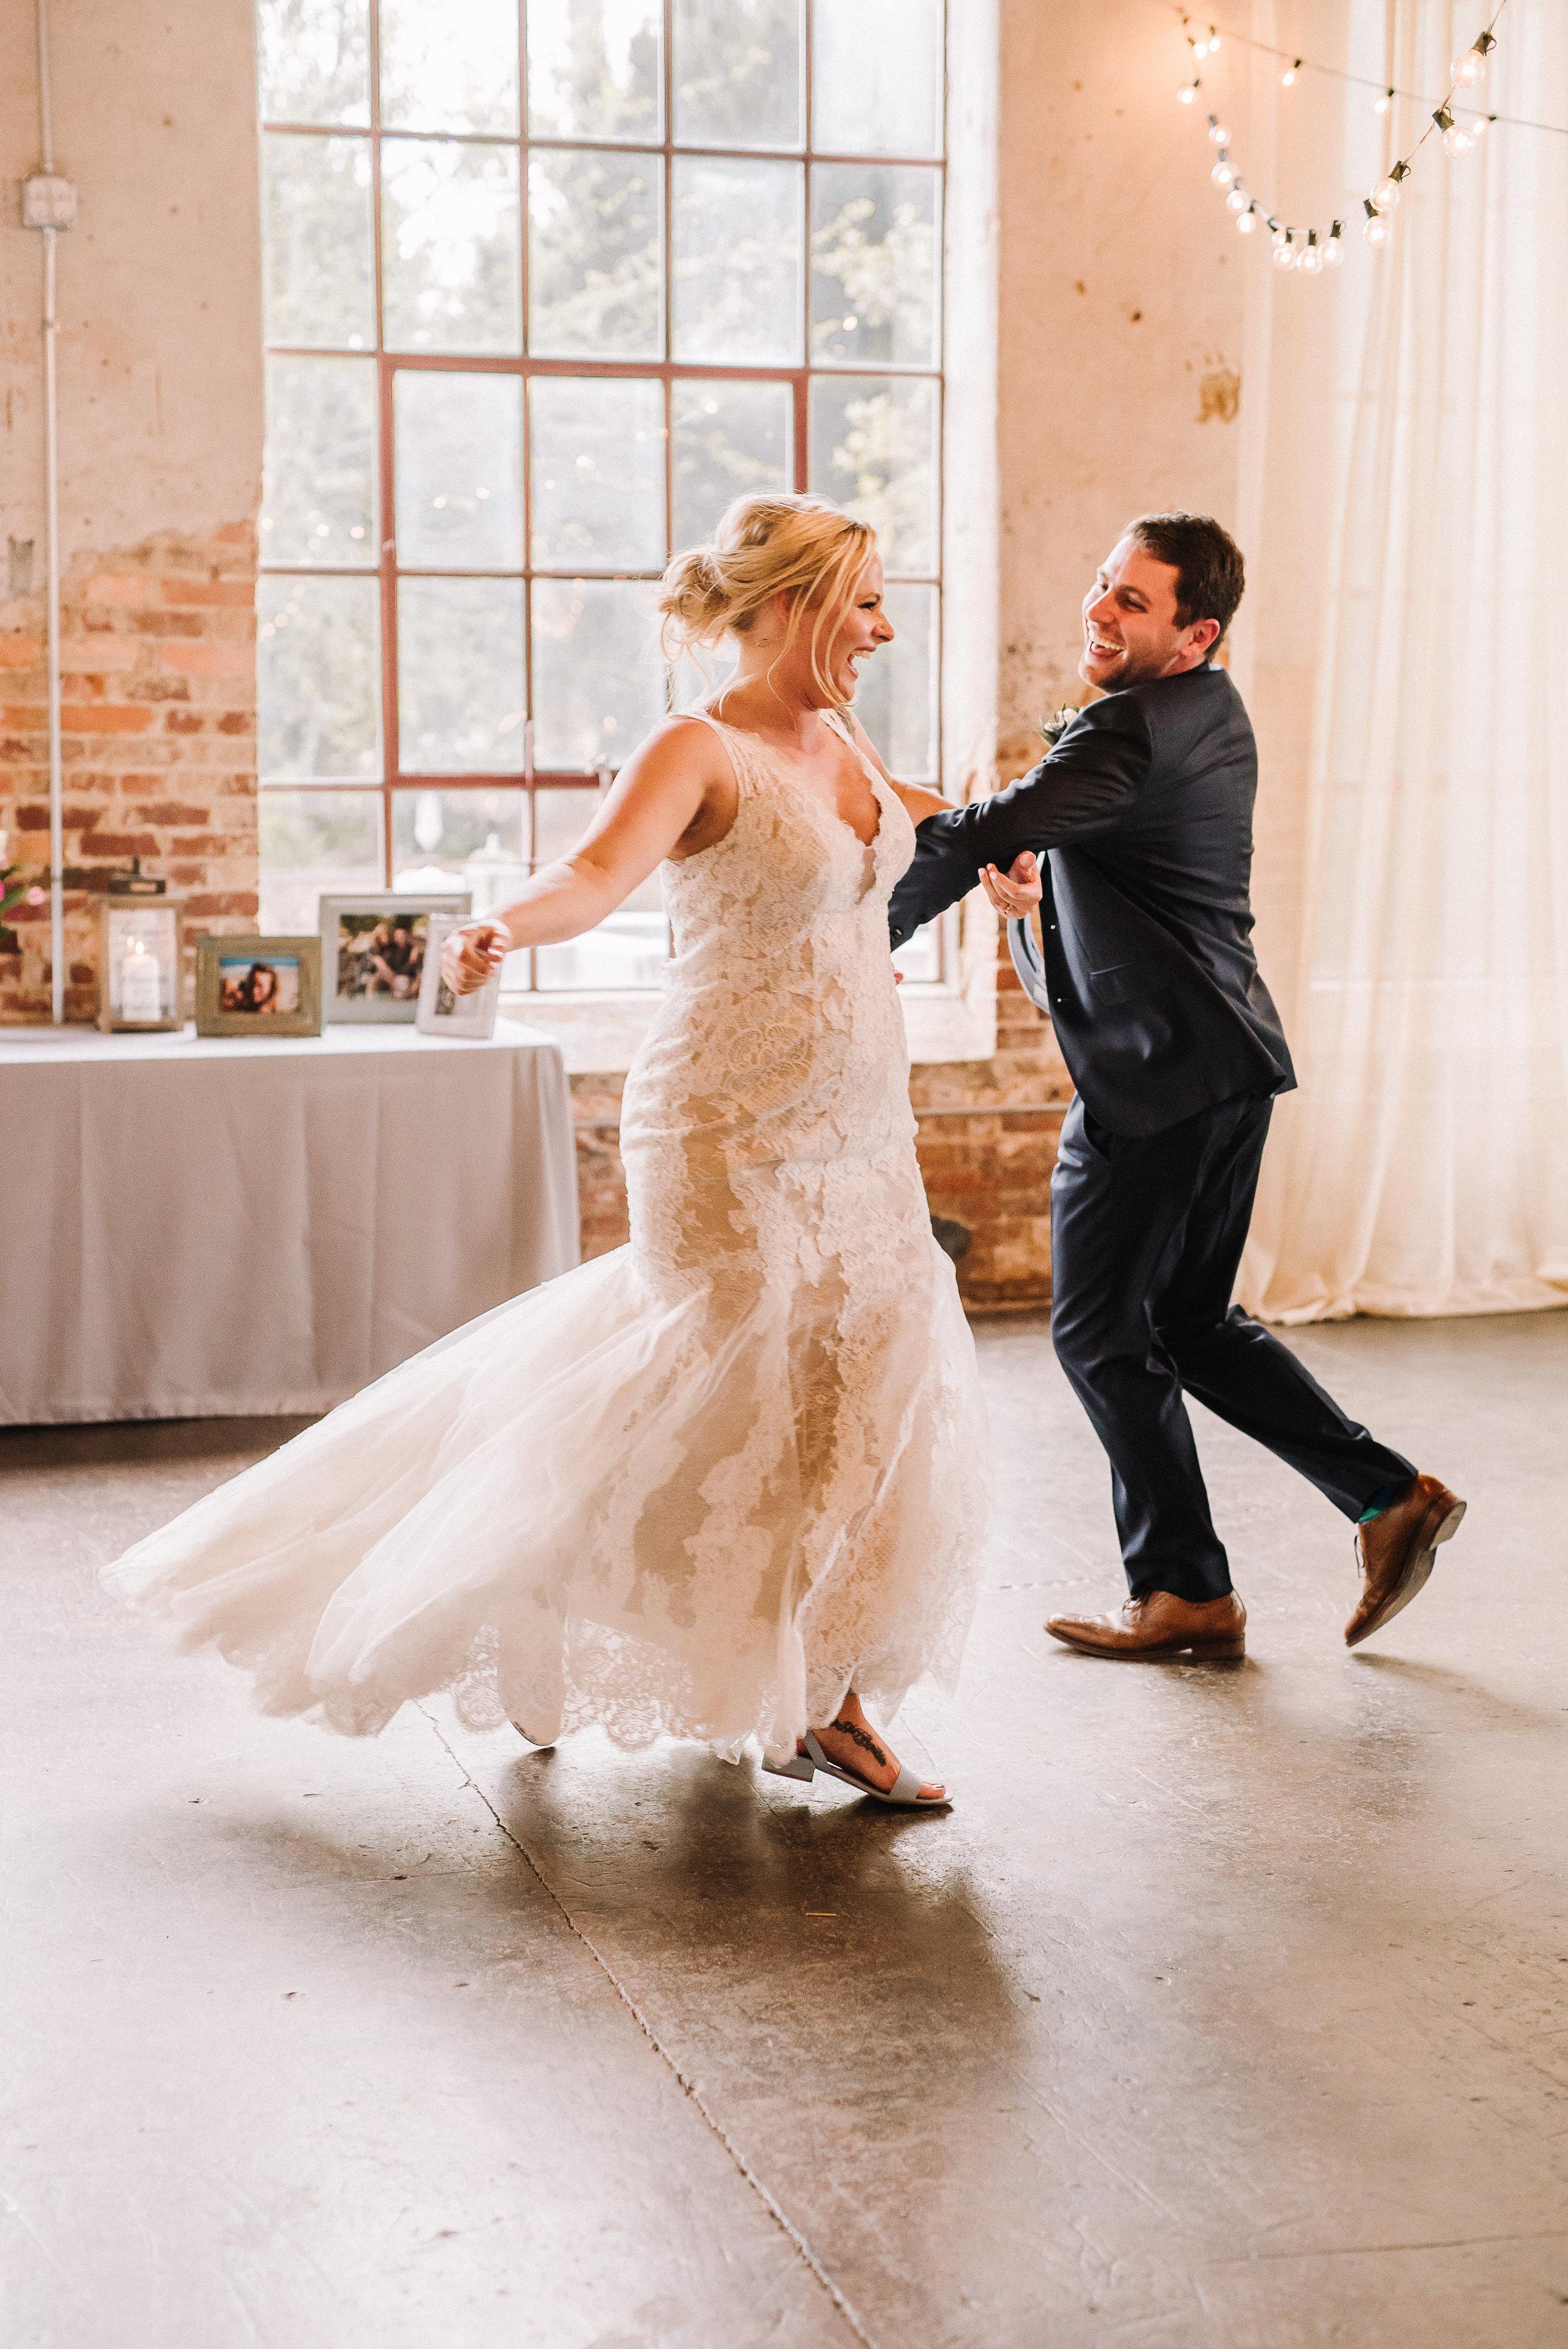 Morgan Wedding_Mill at Yellow River_Ashley Benham Photography-999.jpg